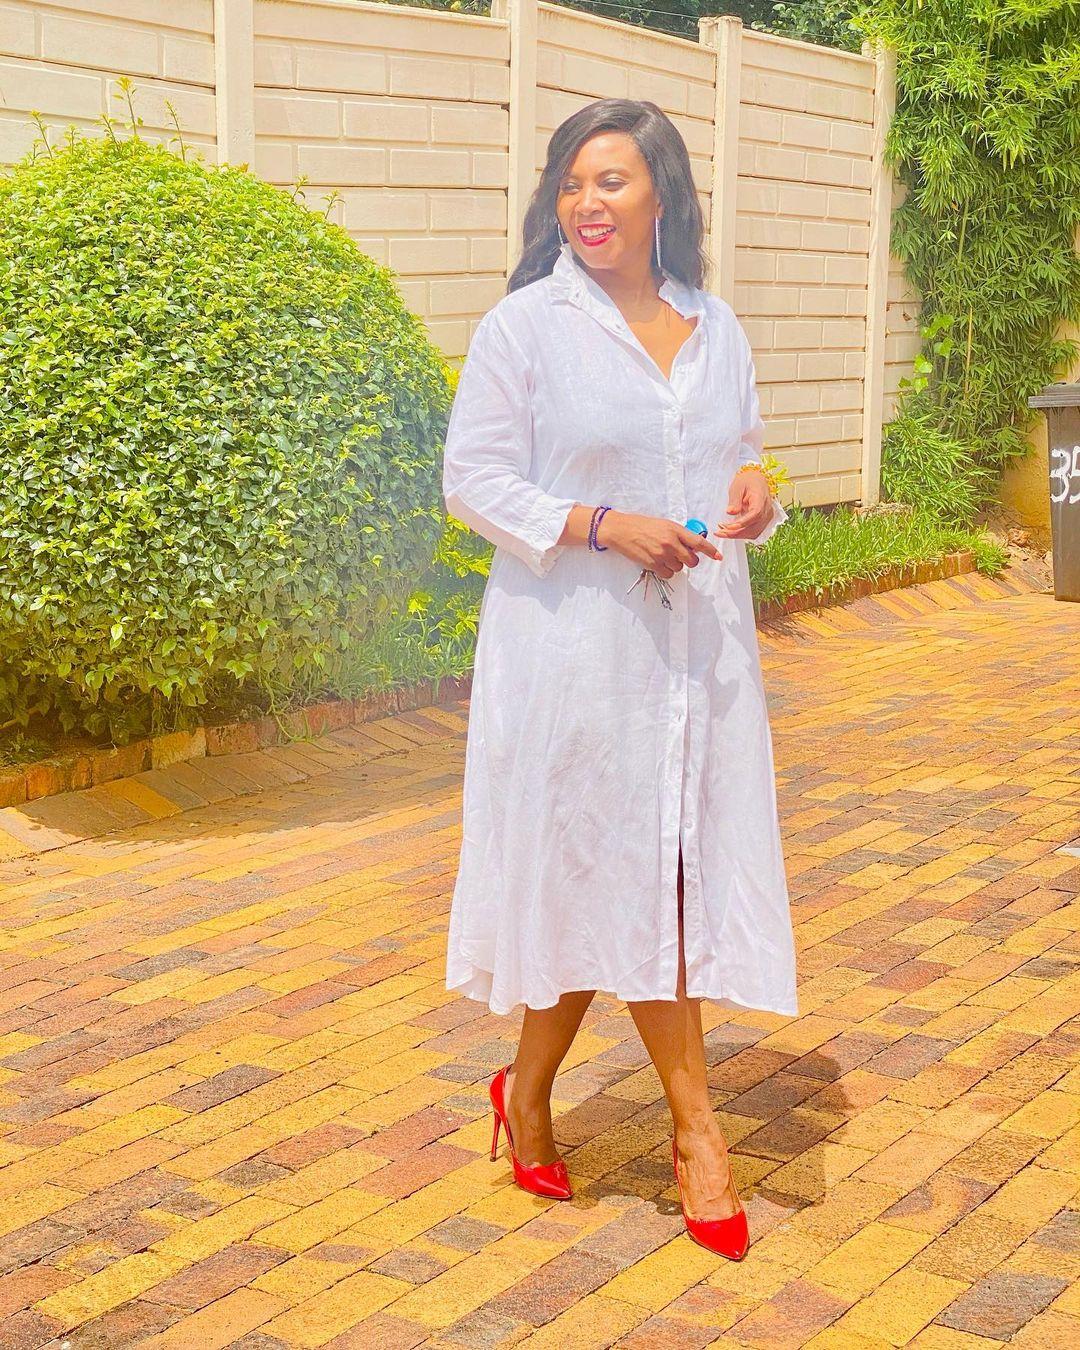 Radio host Penny Lebyane says 'I believe you' to woman who accused DJ Fresh, Euphonik of rape